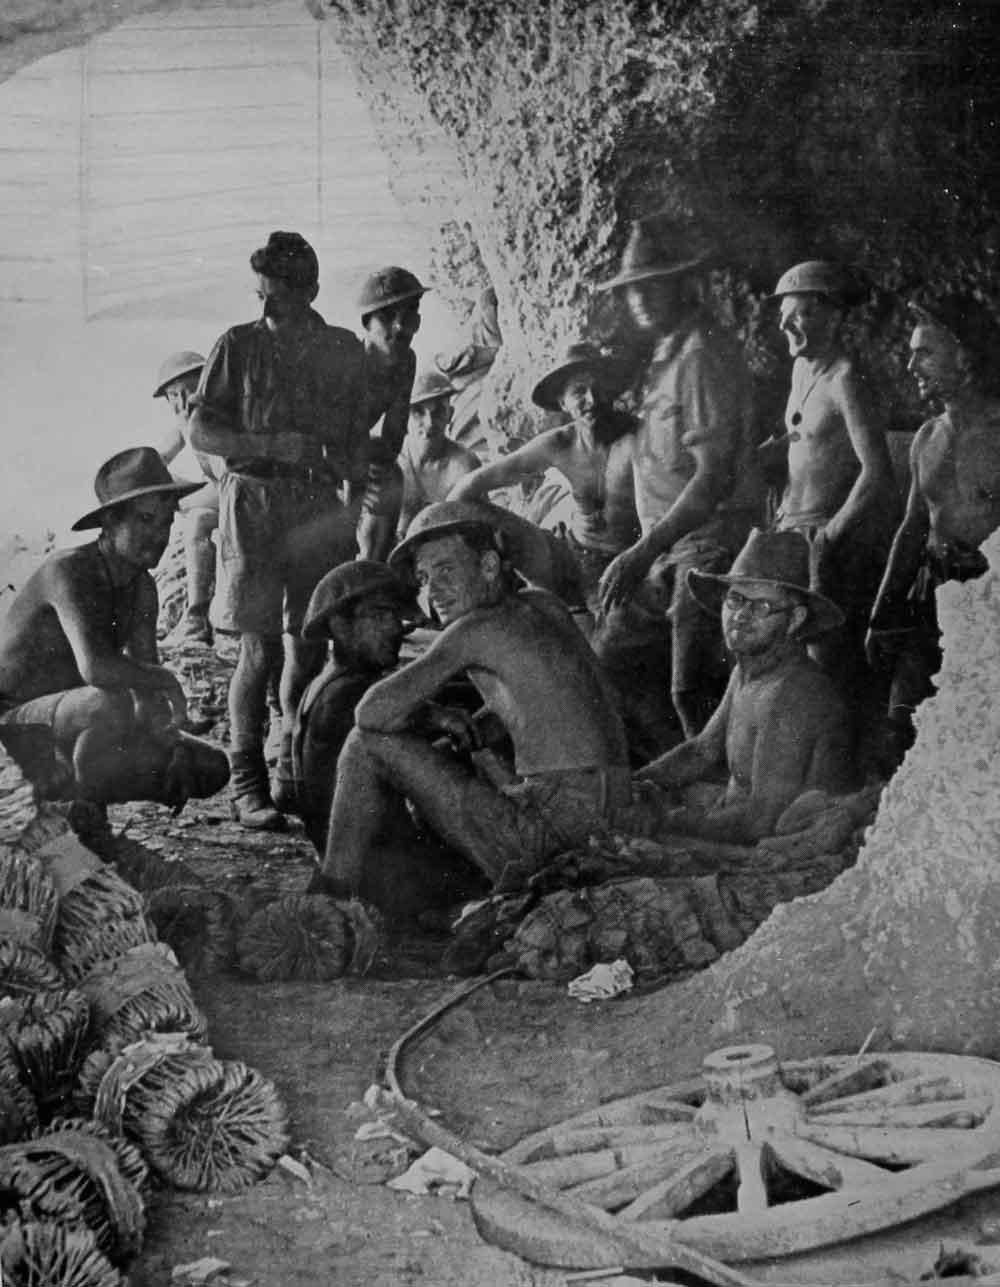 Rats-of-Tobruk-Australian-troops